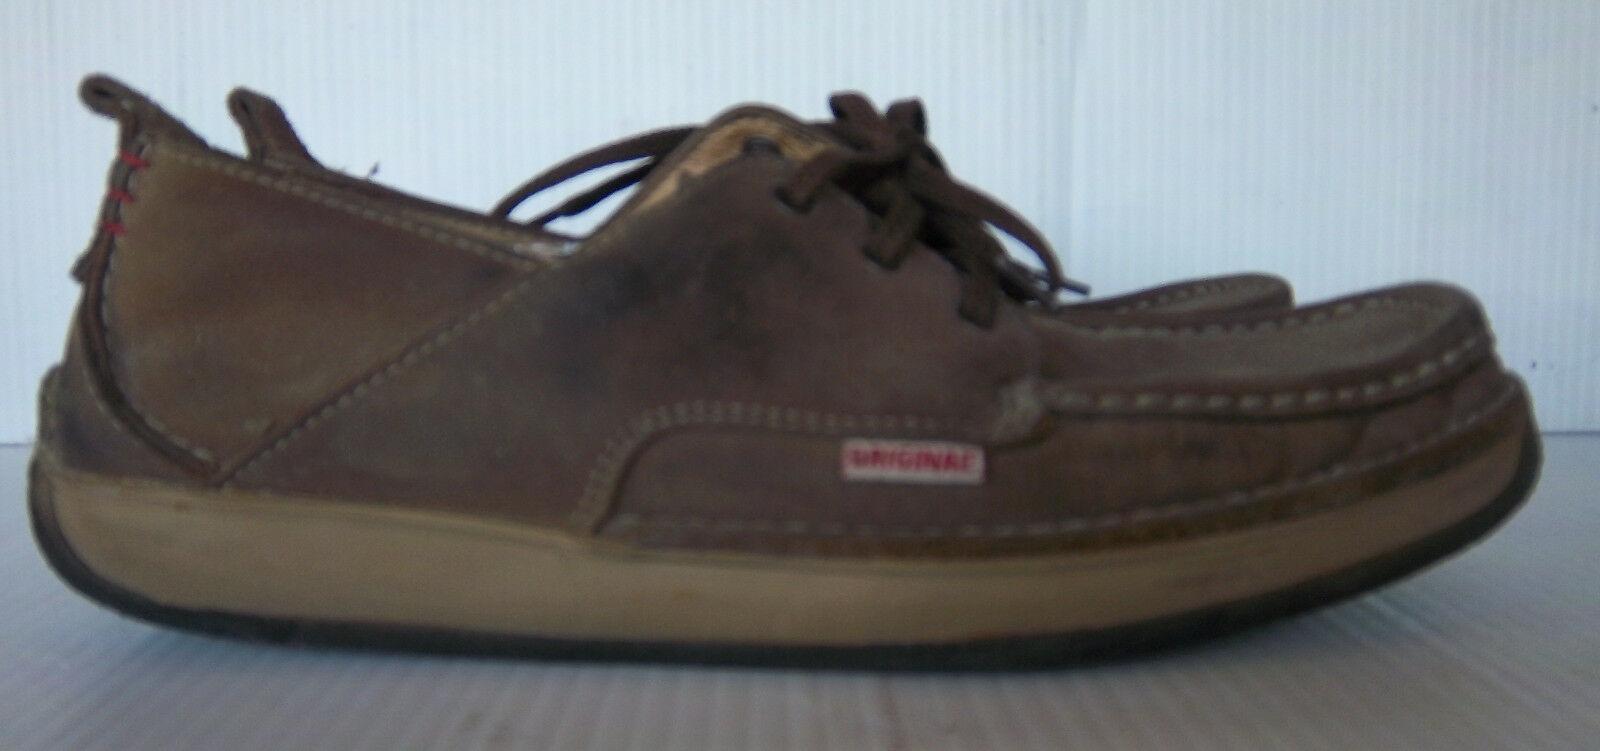 CLARKS - Men's Originals Brown Leather Lace up Boat Shoes -- Size 8M